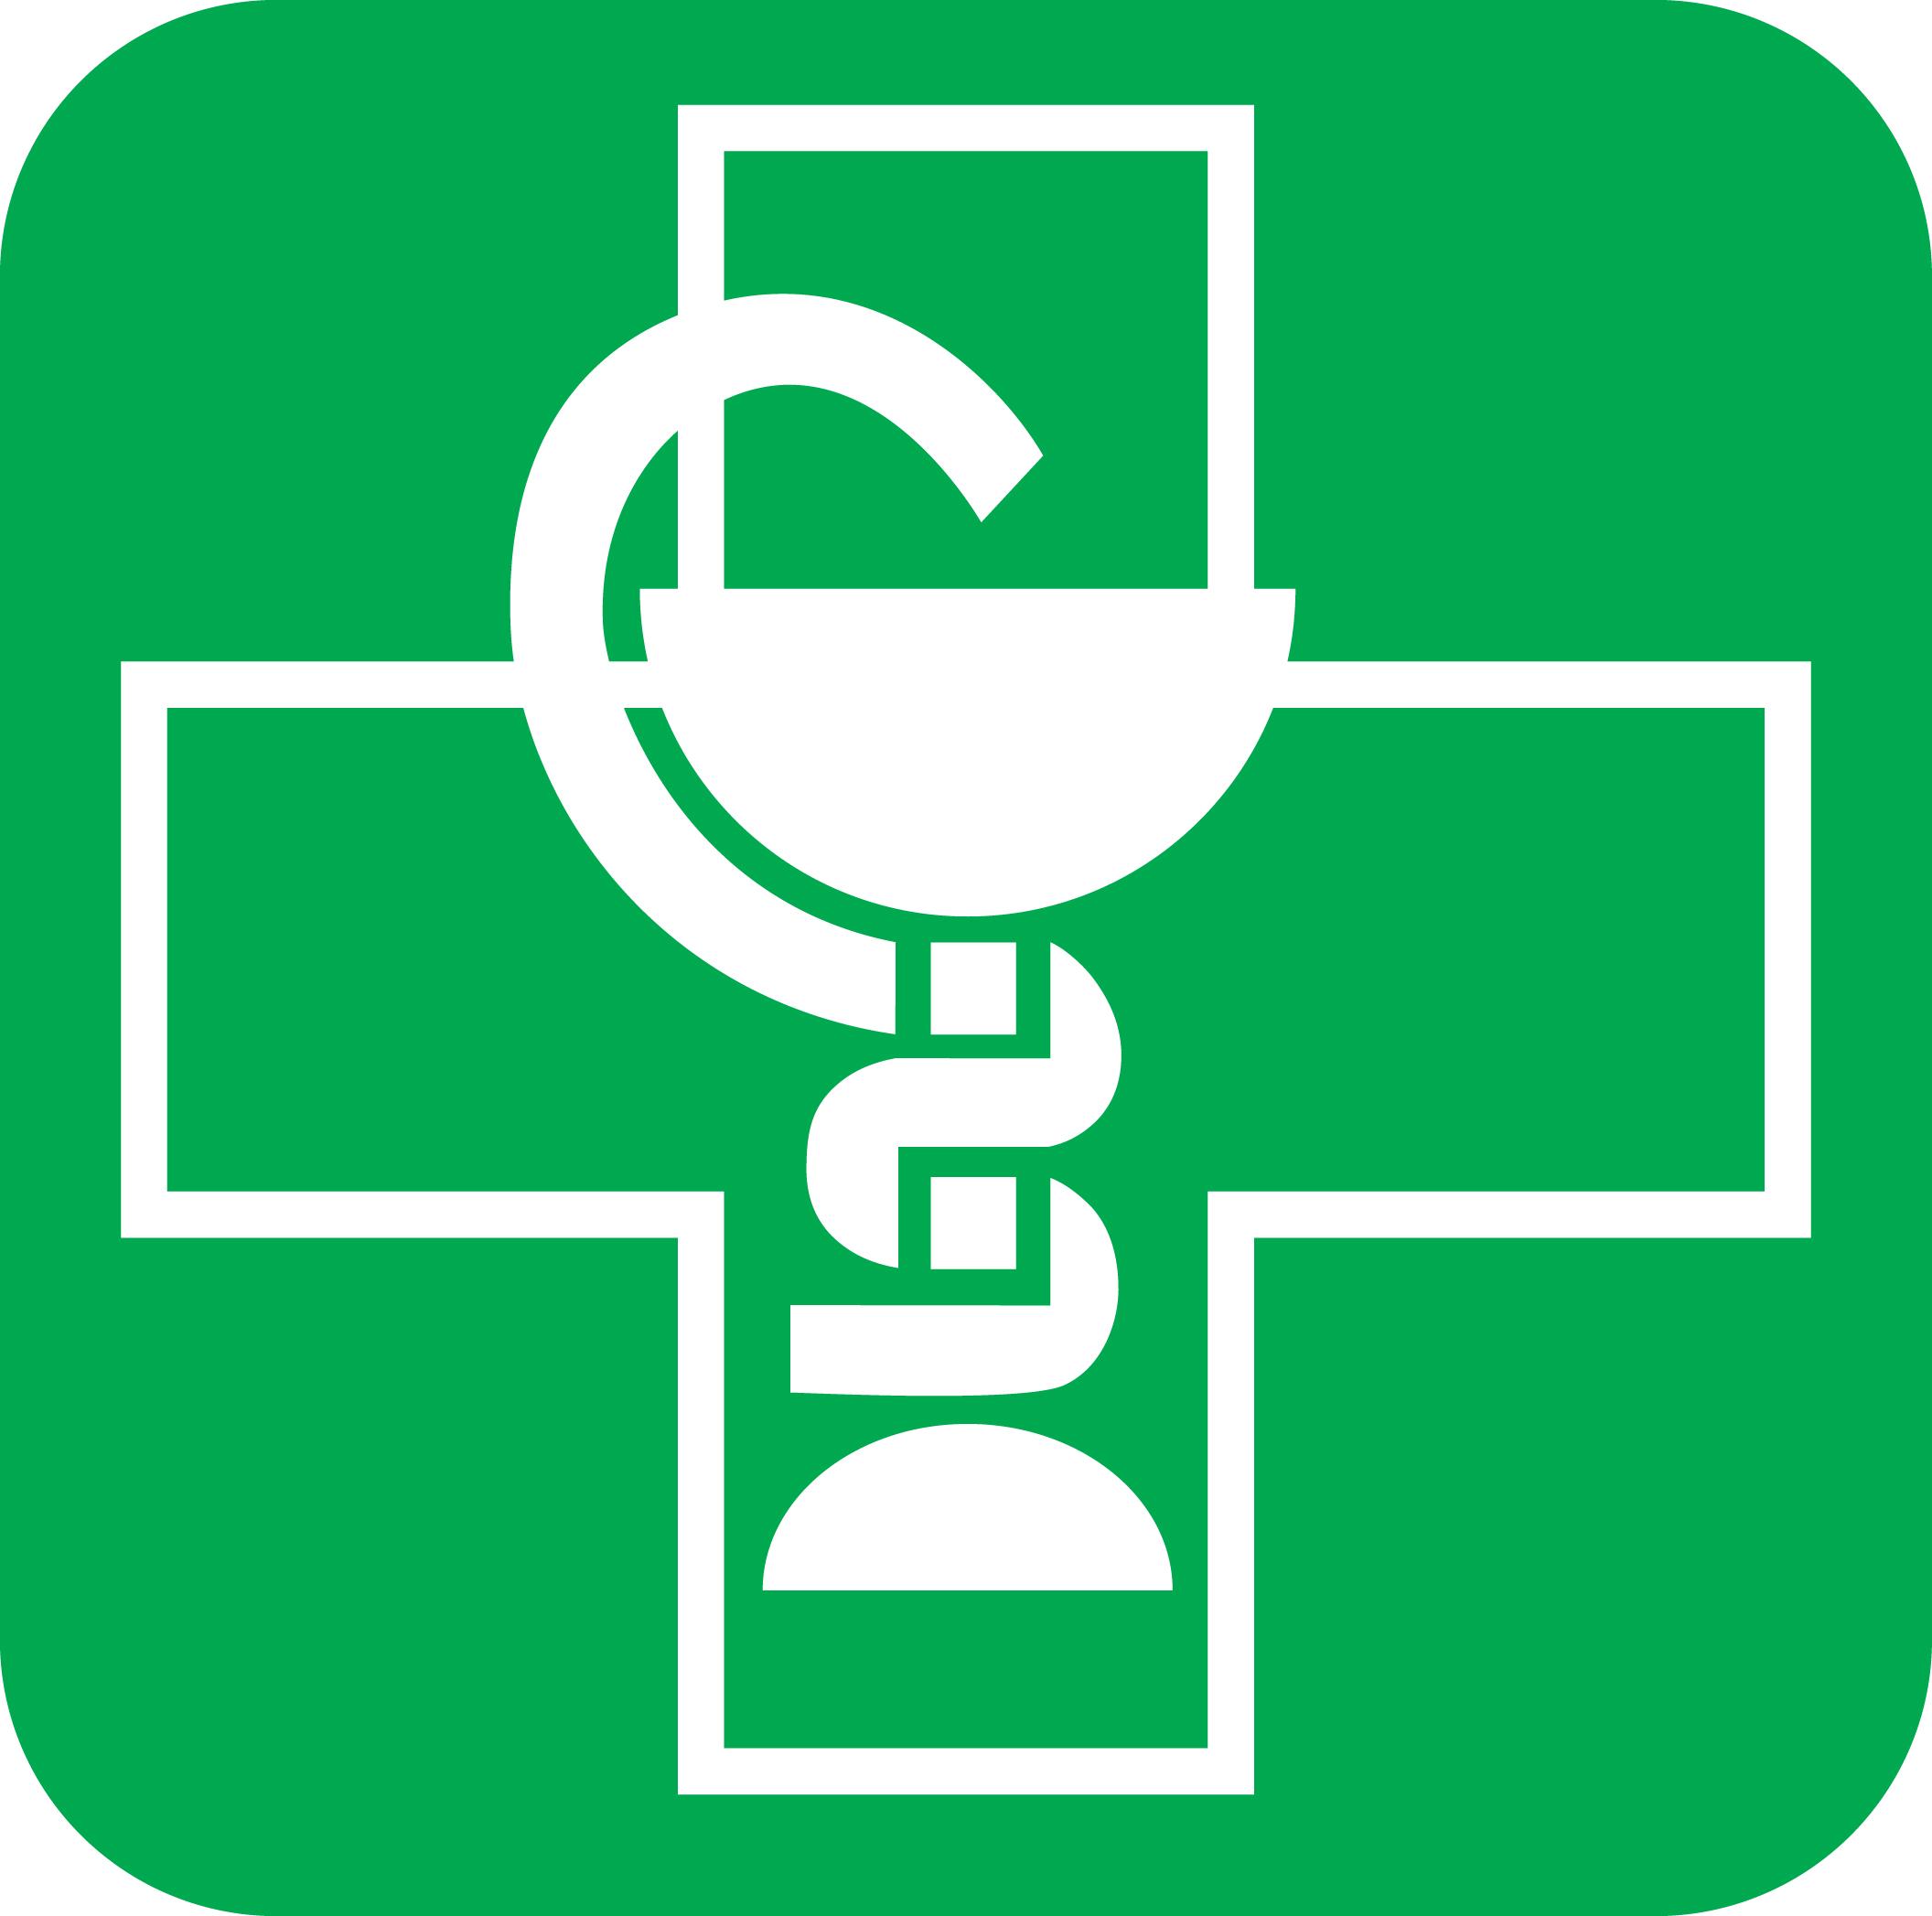 Pharmacie Comment nous contacter